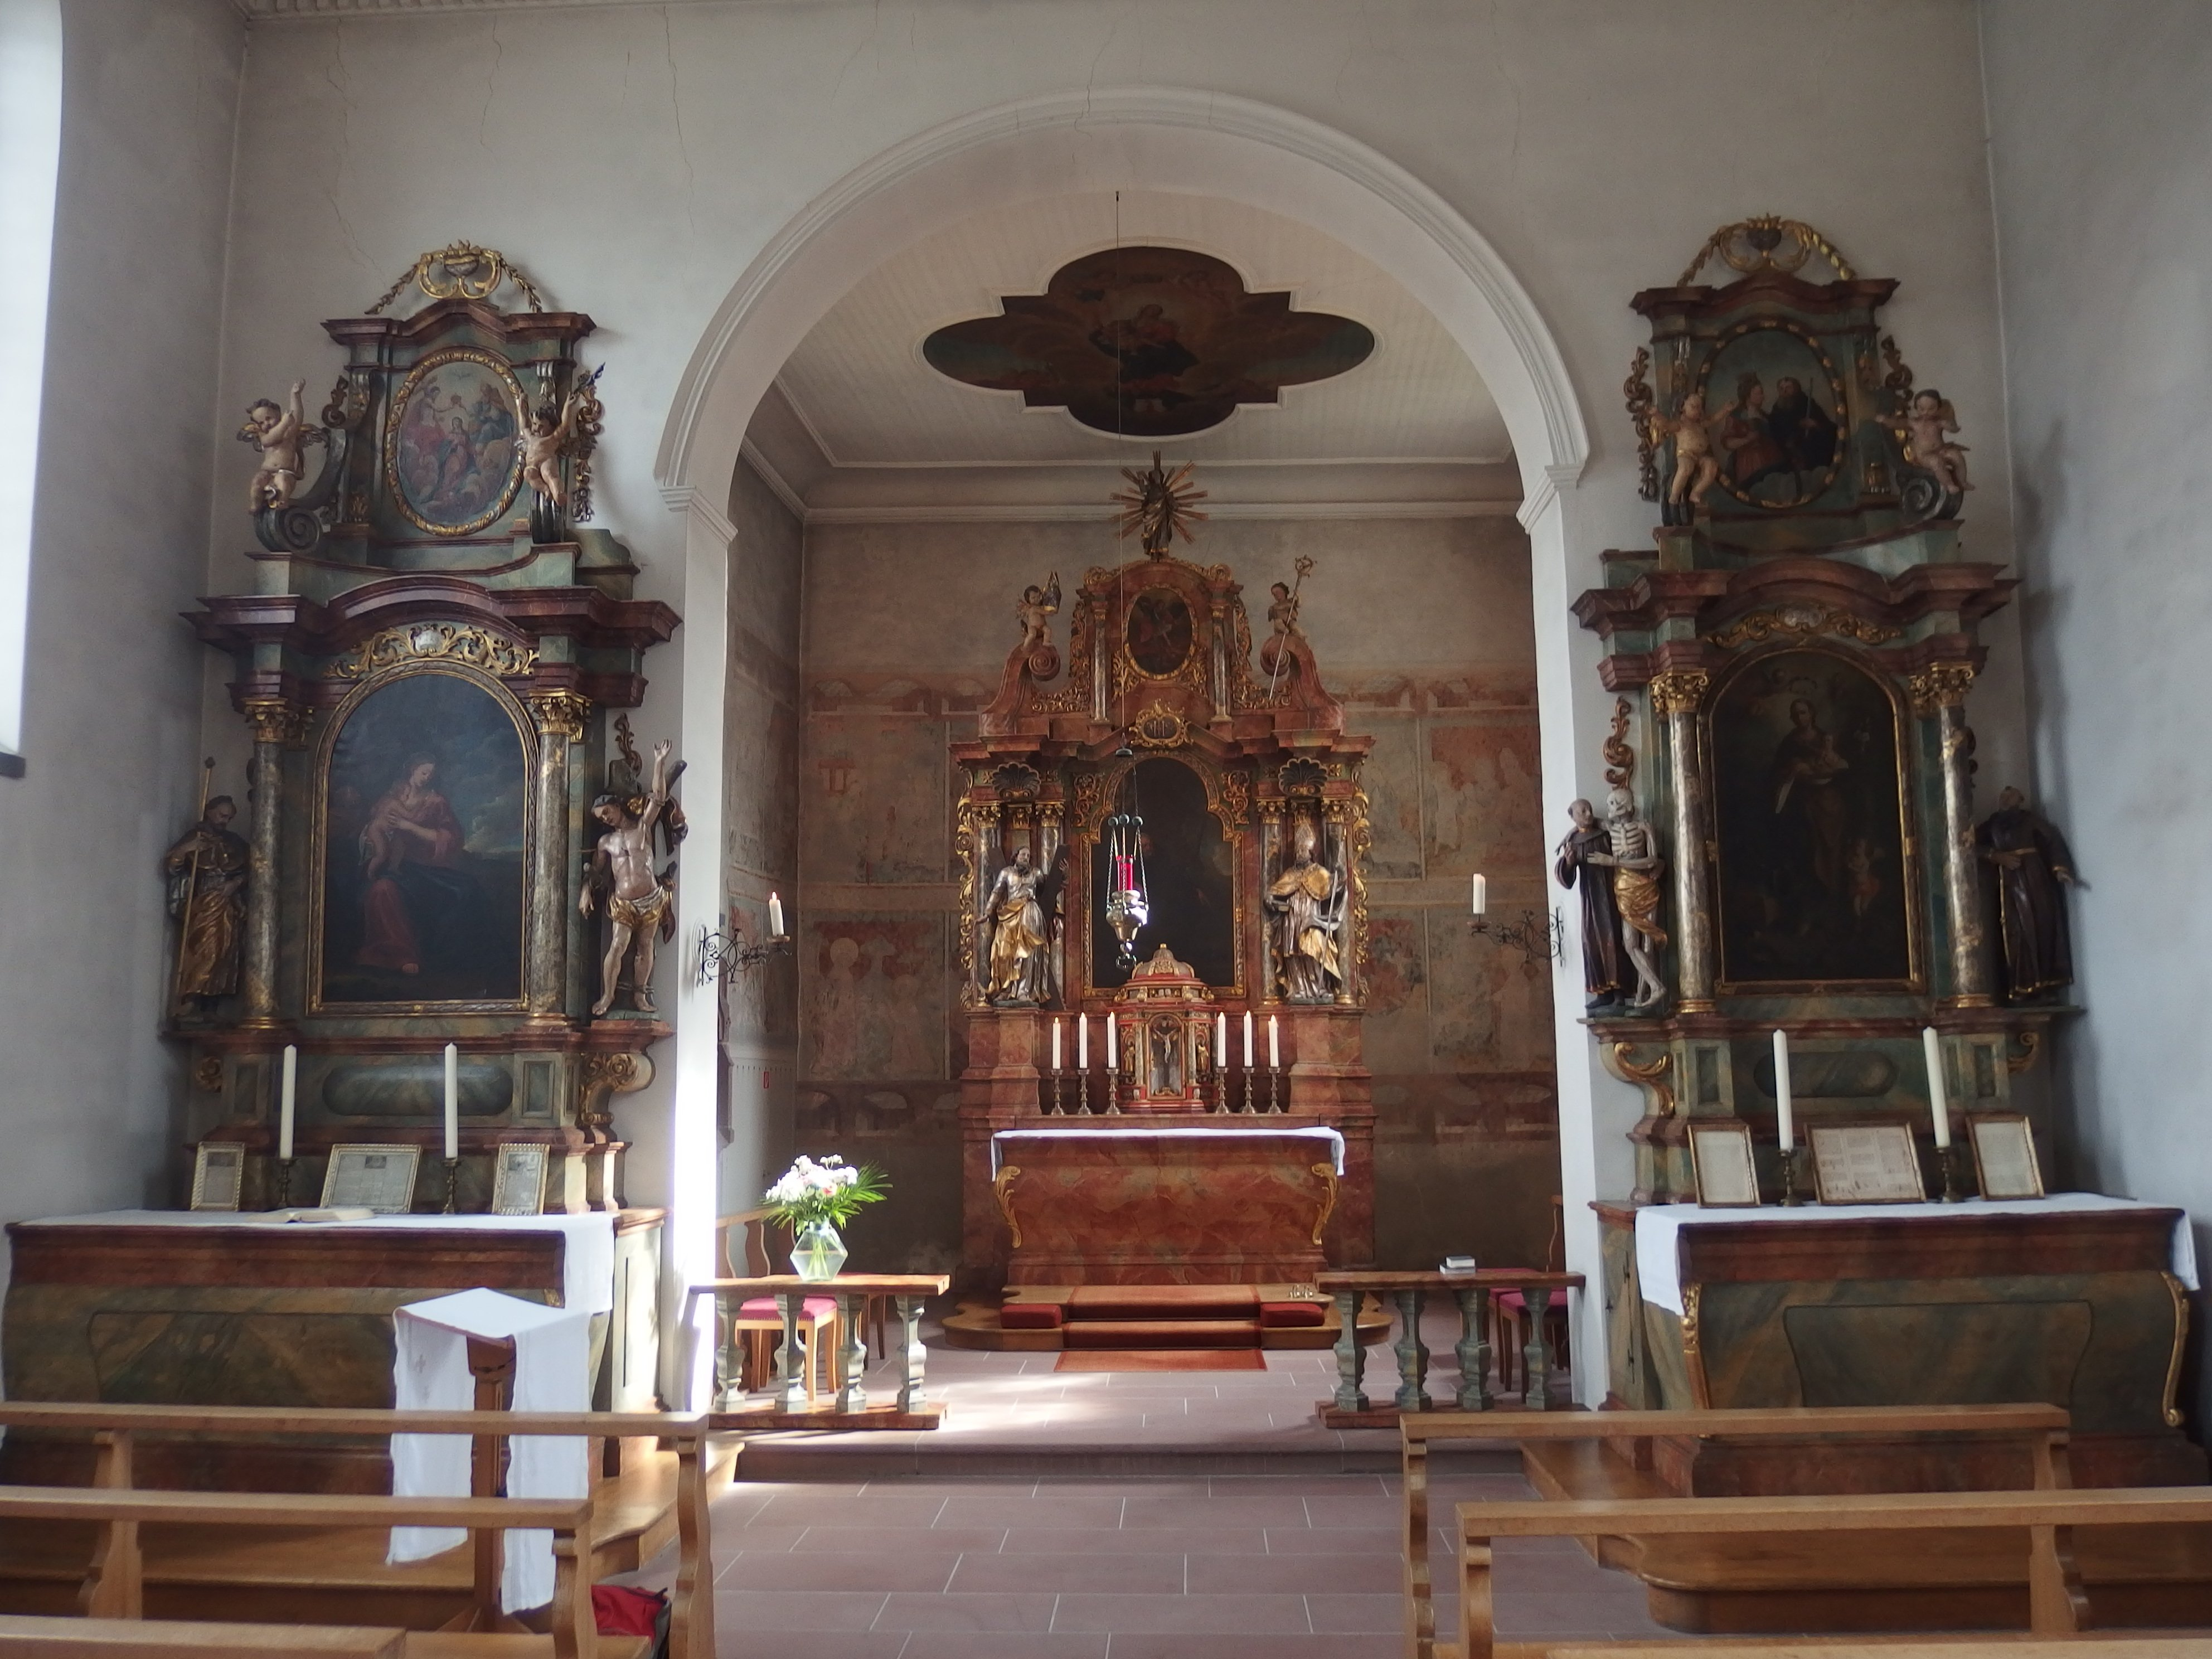 St. Gallus Kaiseraugst